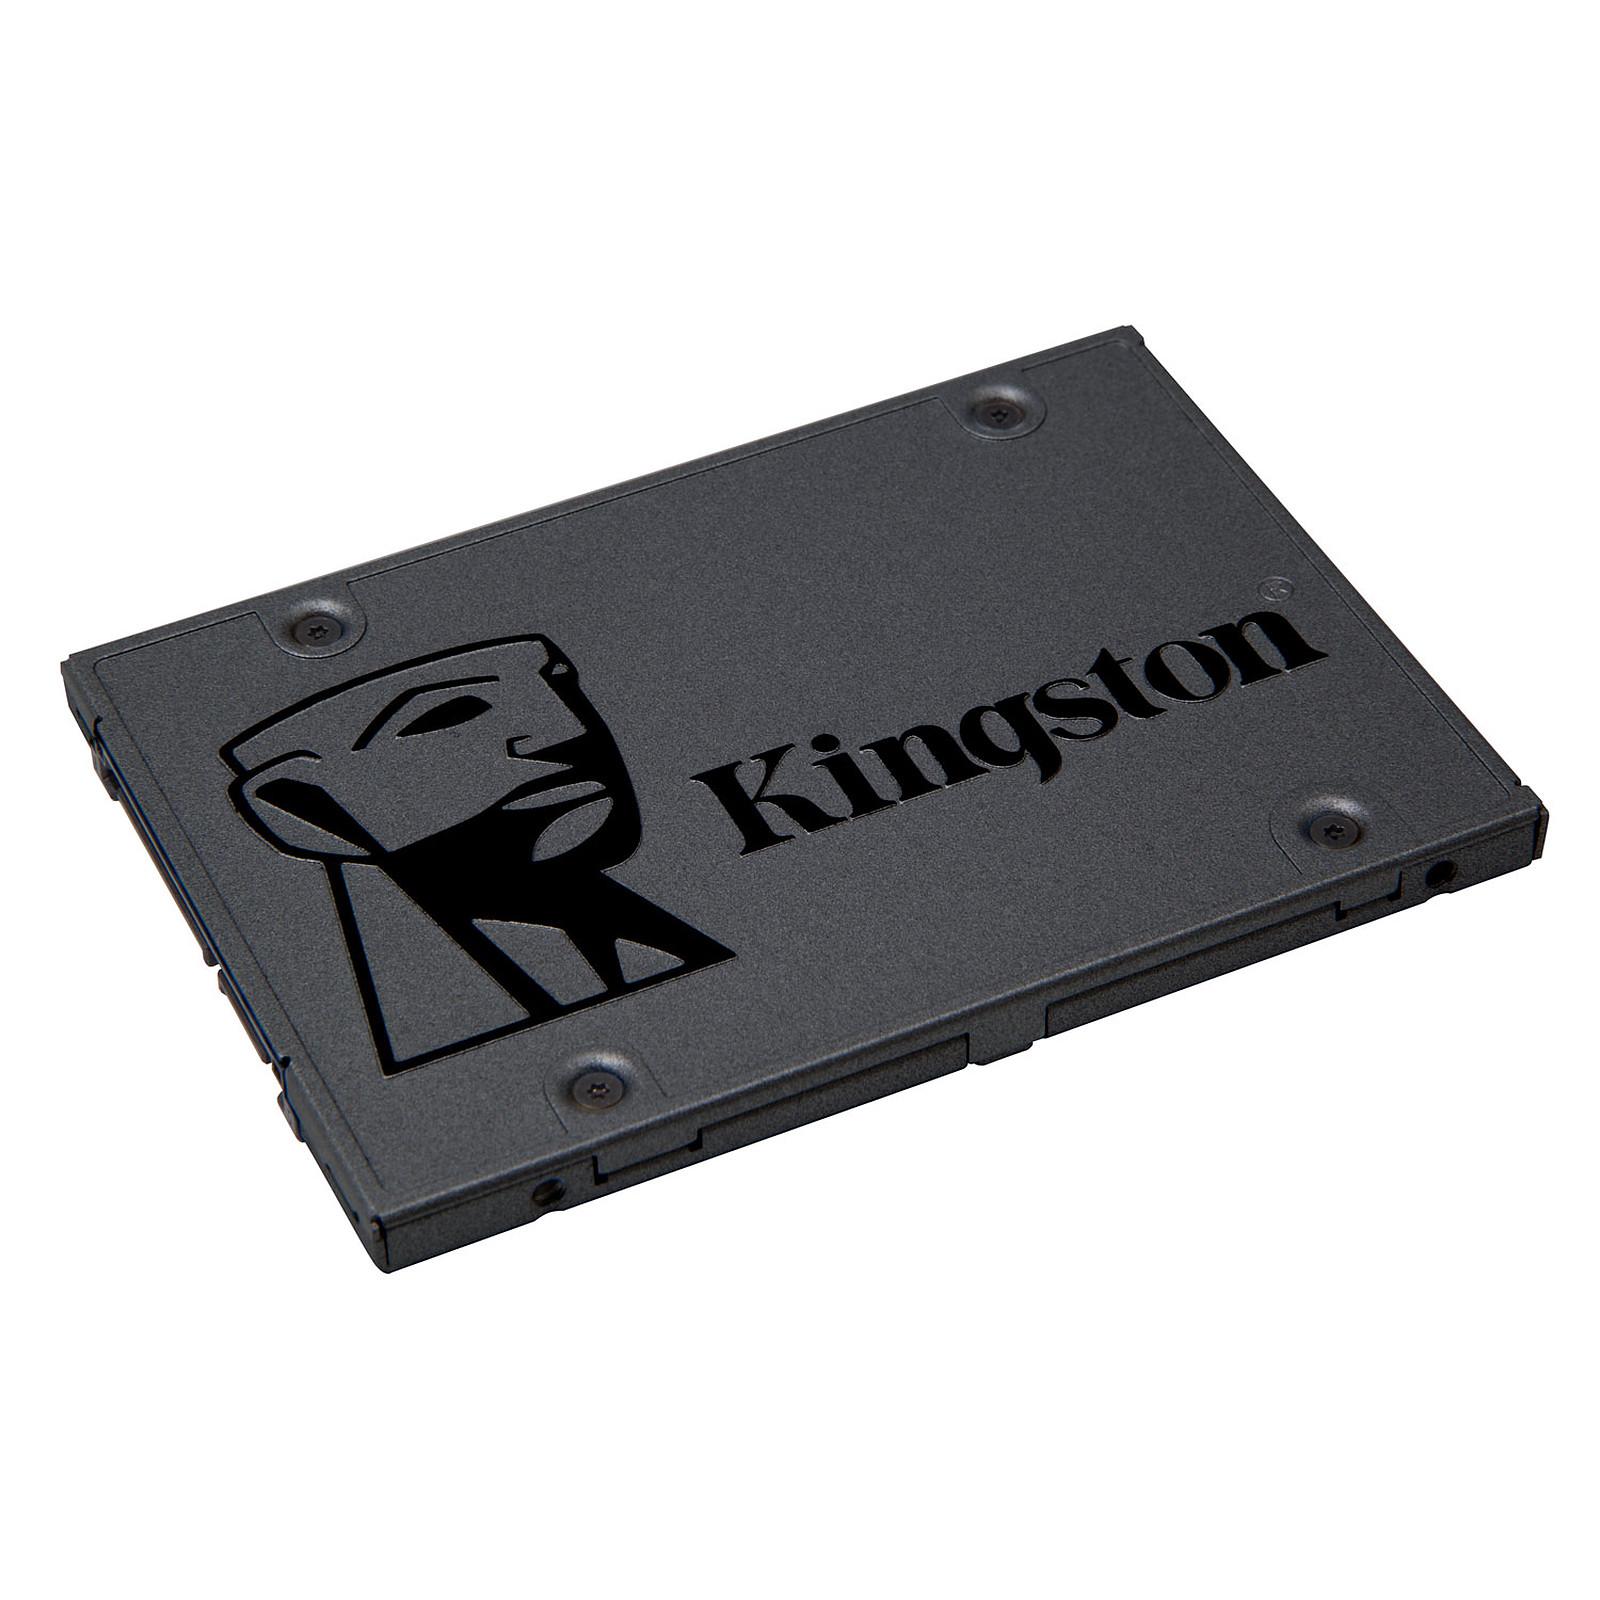 Kingston SSD A400 1.92 To